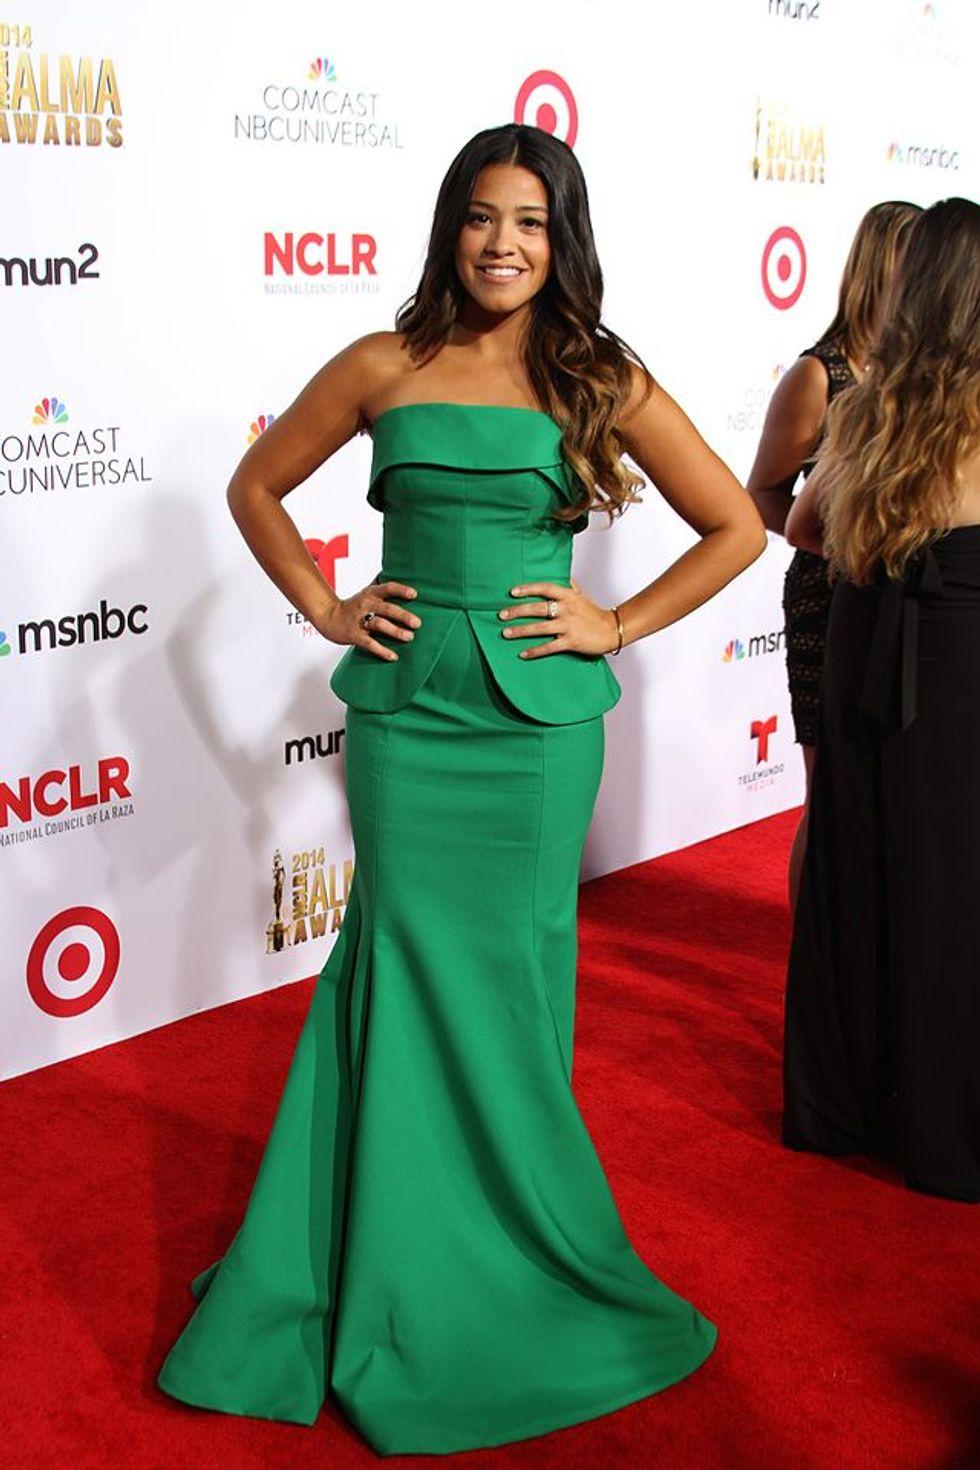 Gina Rodriguez Won the Entire Golden Globes